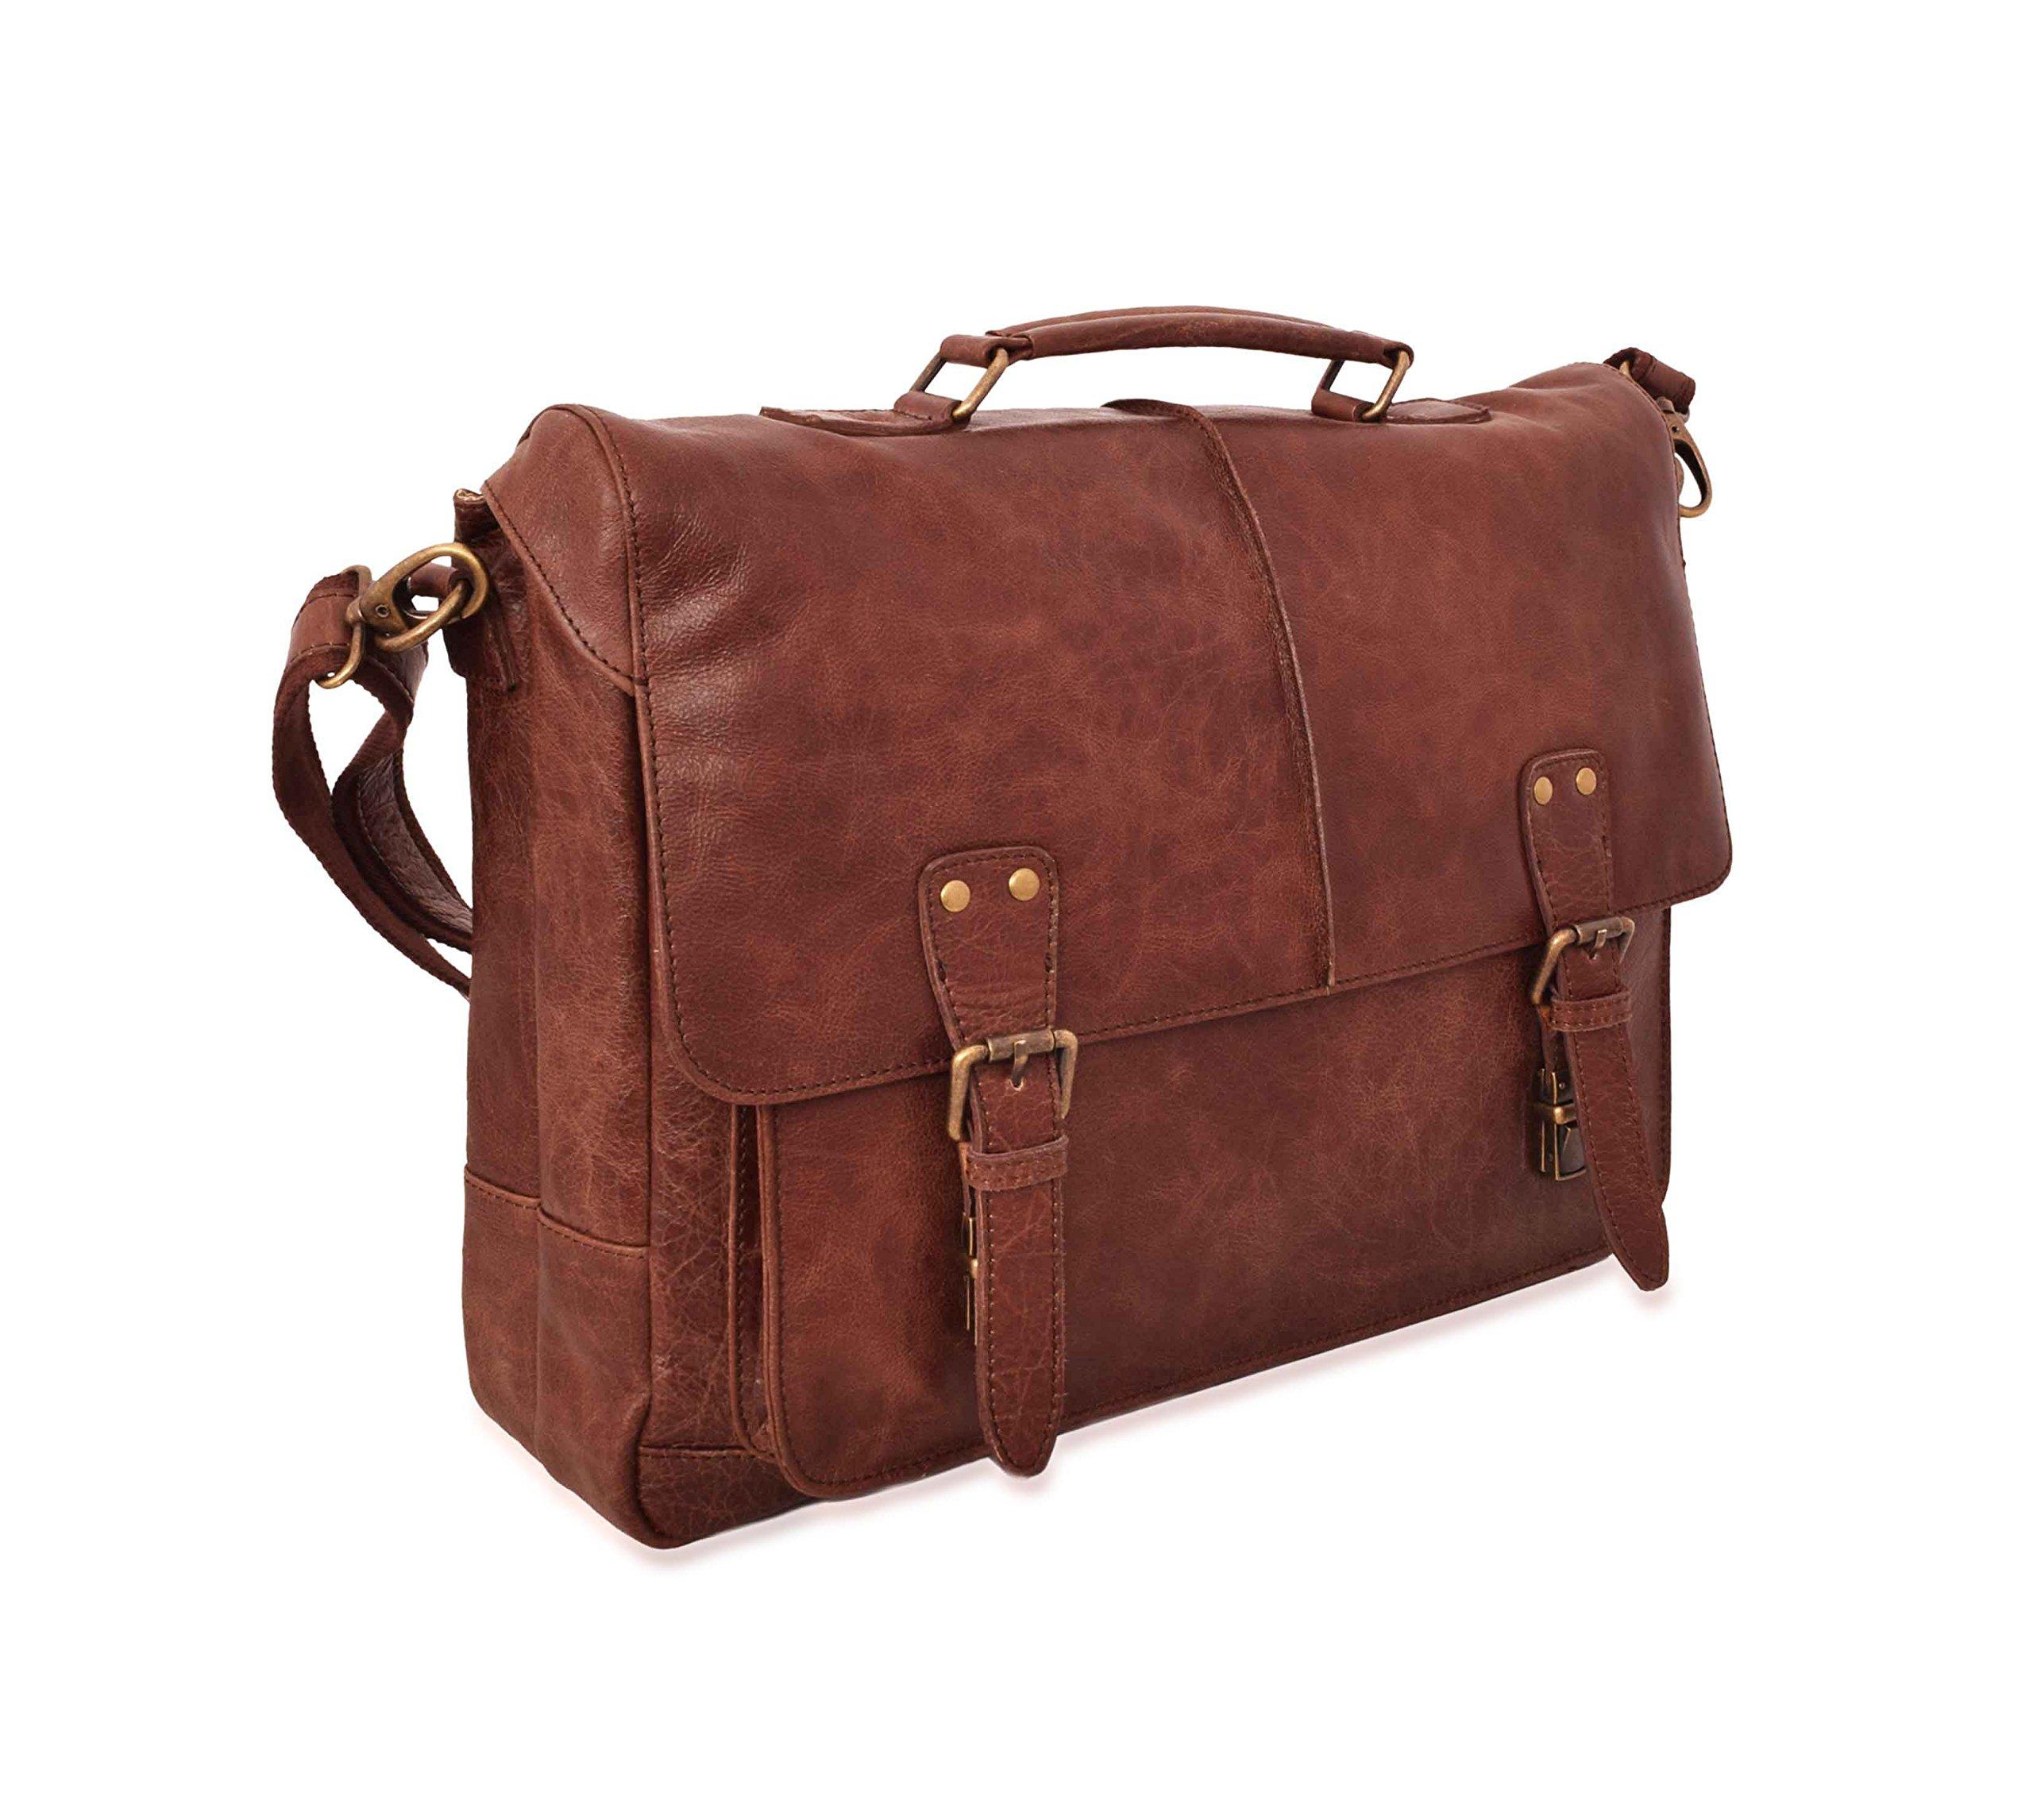 "V-élan Men's Vintage Leather Briefcase With Laptop Sleeve 15.25''W x 12''H x 2.75""D Tan by V-élan"